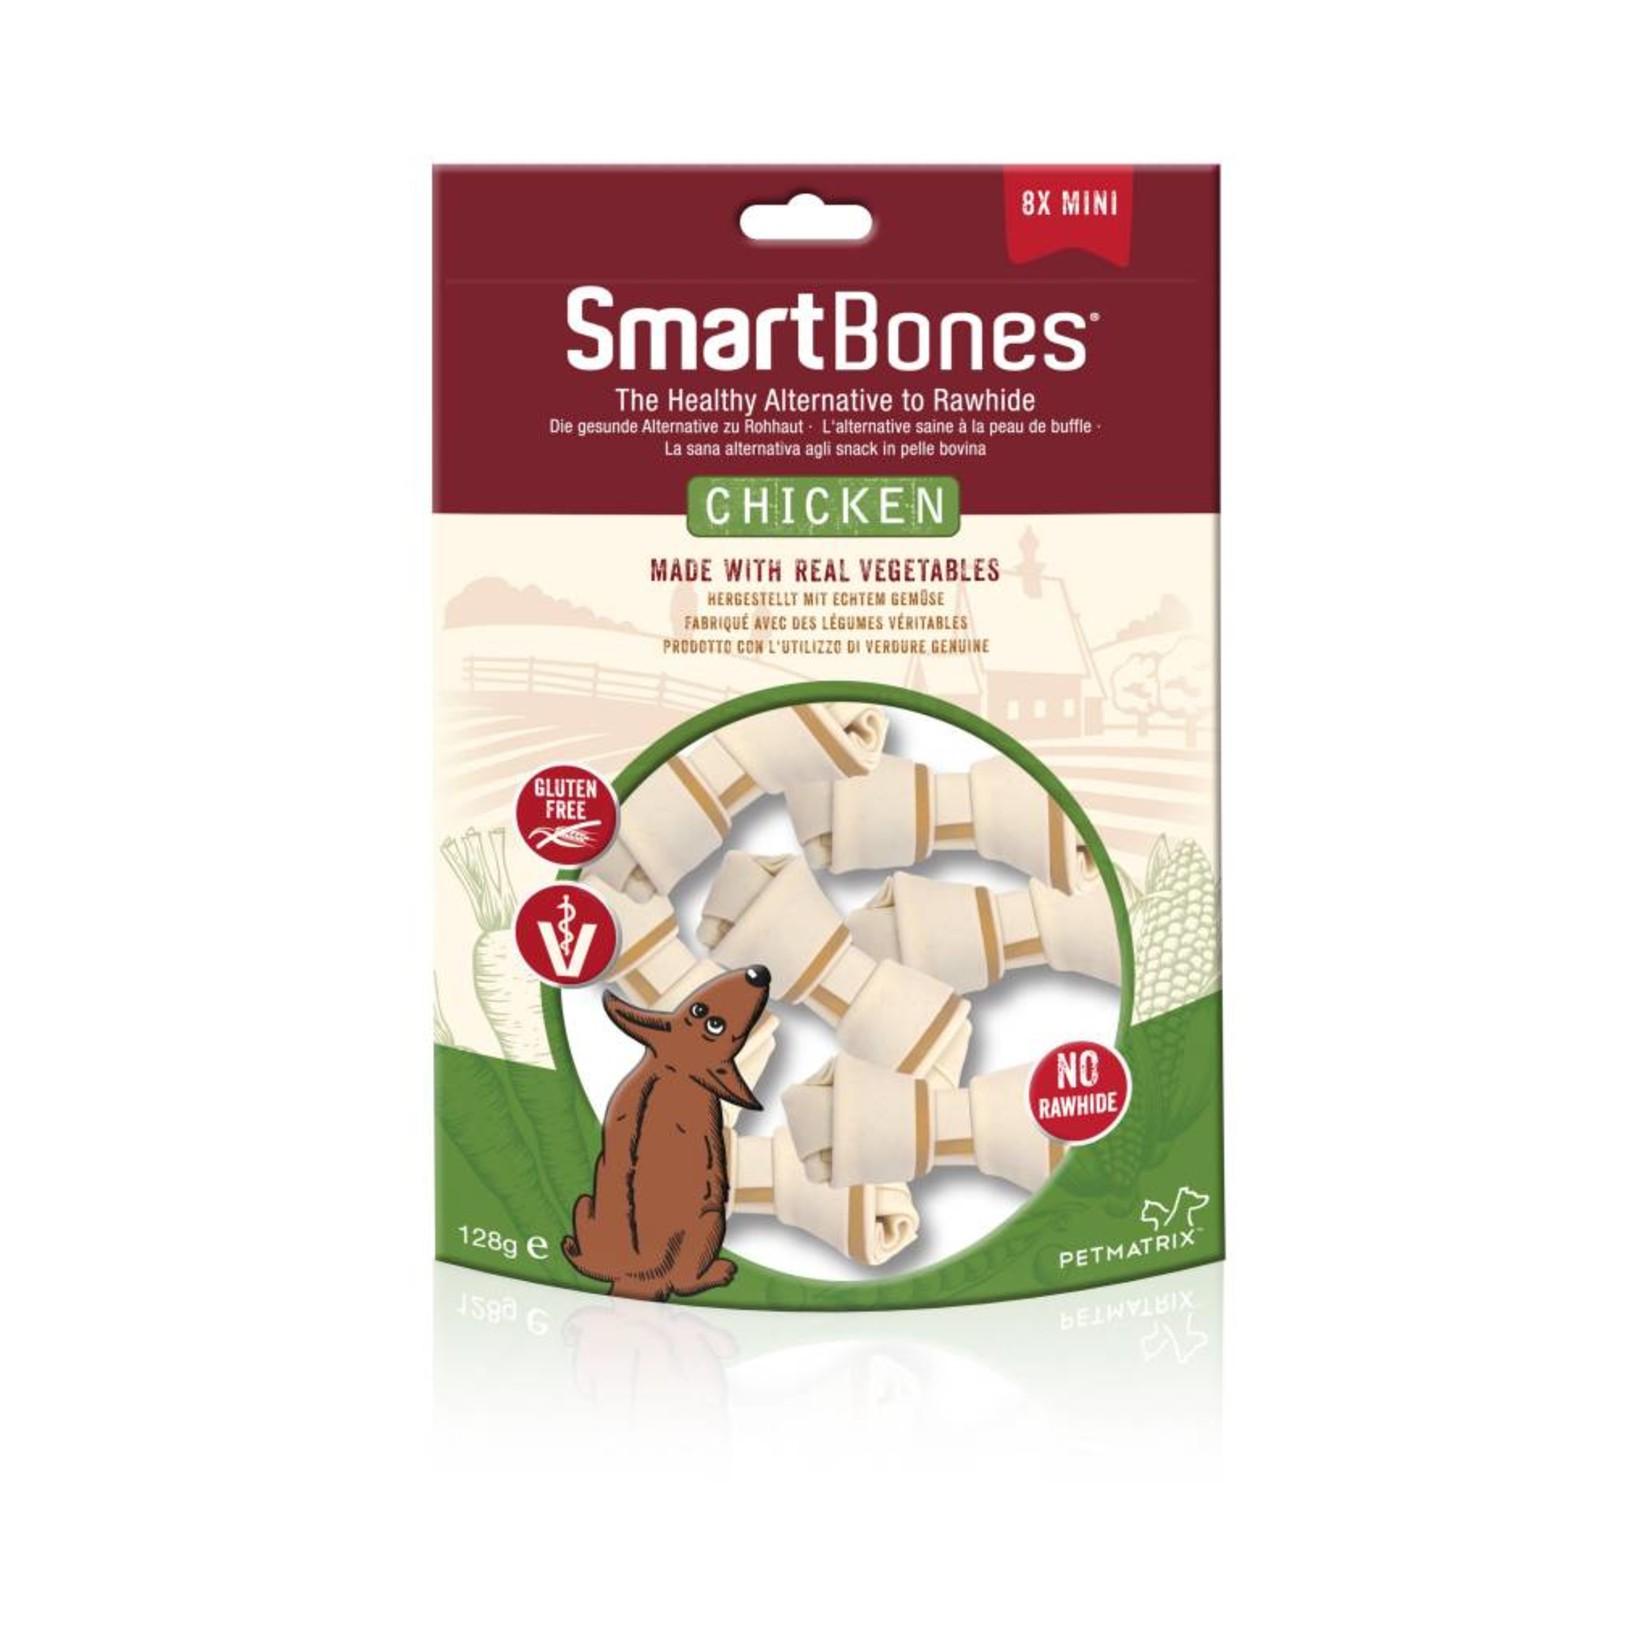 SmartBones Rawhide Alternative Chicken Bones Dog Treats, Mini, 8 pack